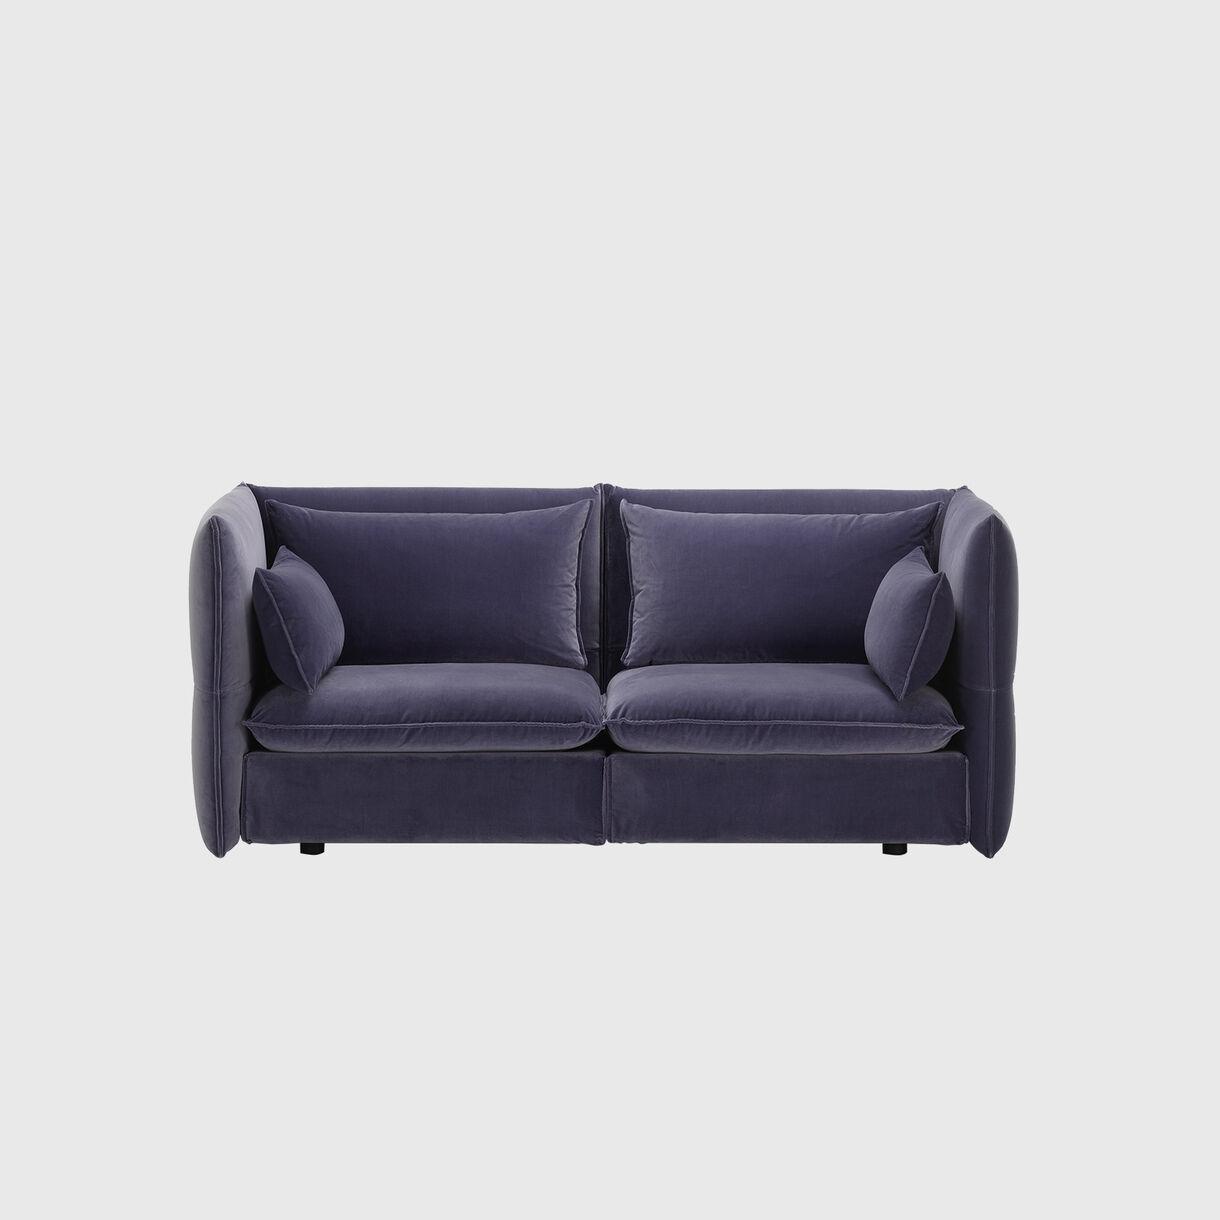 Mariposa Sofa, 2 Seater